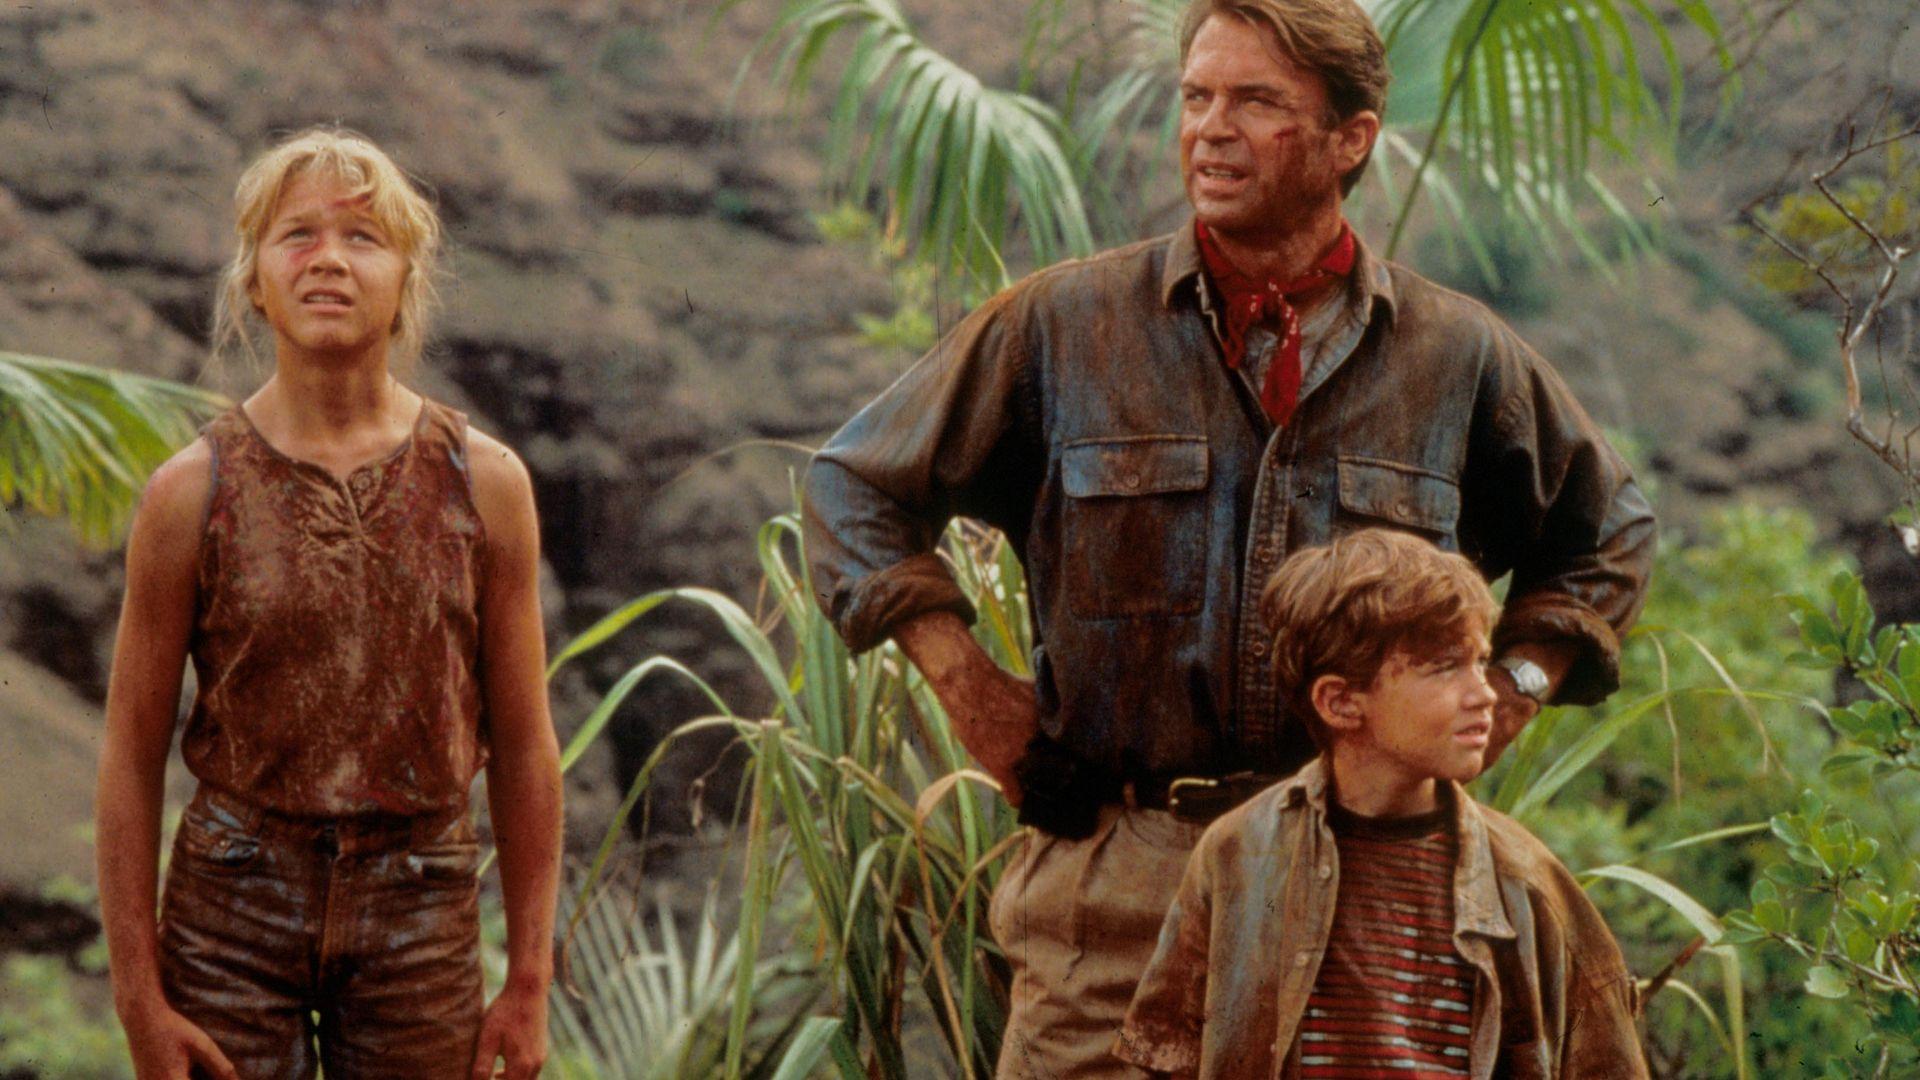 Quot Jurassic Park Quot Was Machen Die 90er Stars Heute